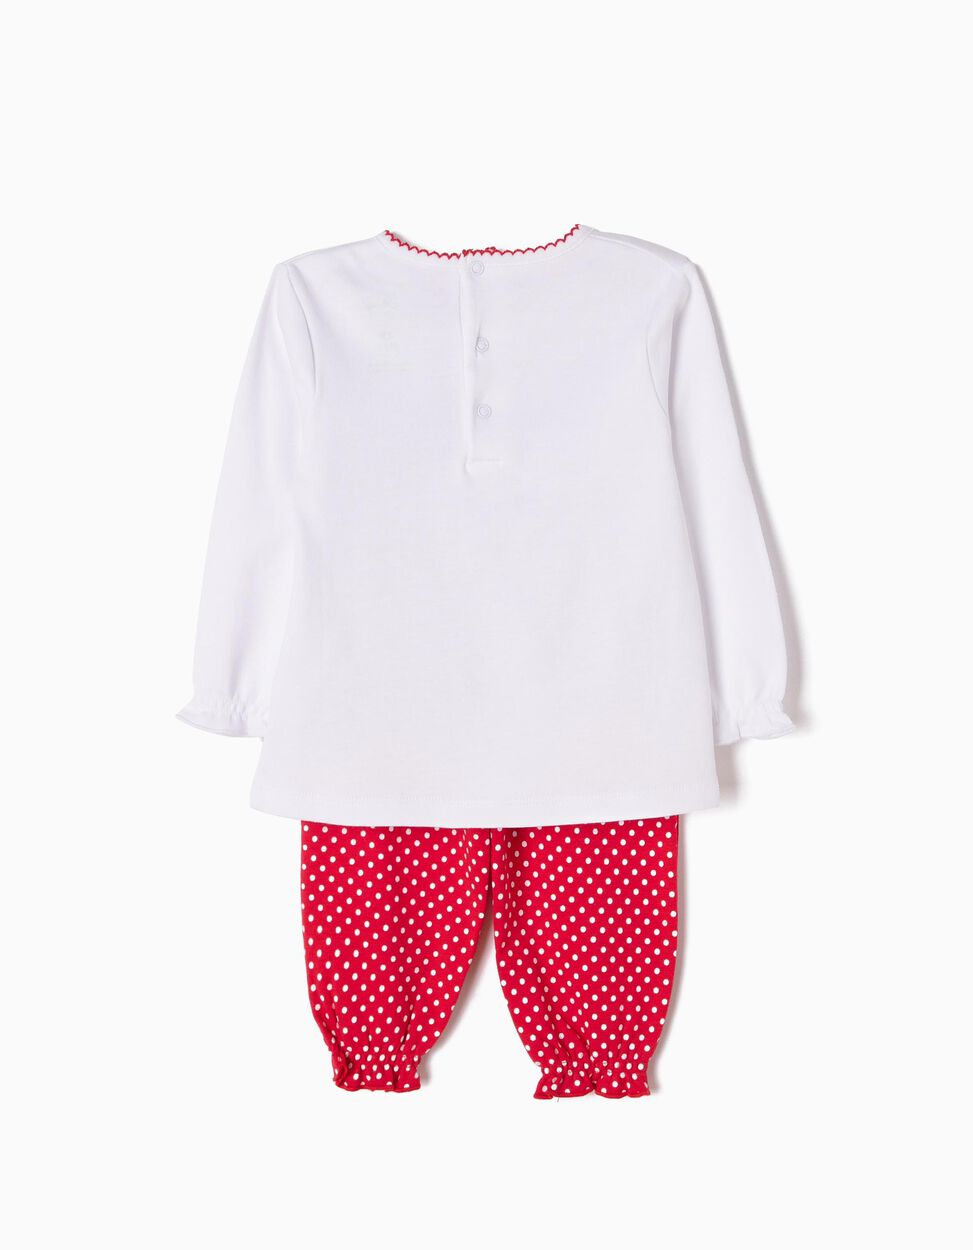 Pijama Manga Comprida e Calças Minnie Smile